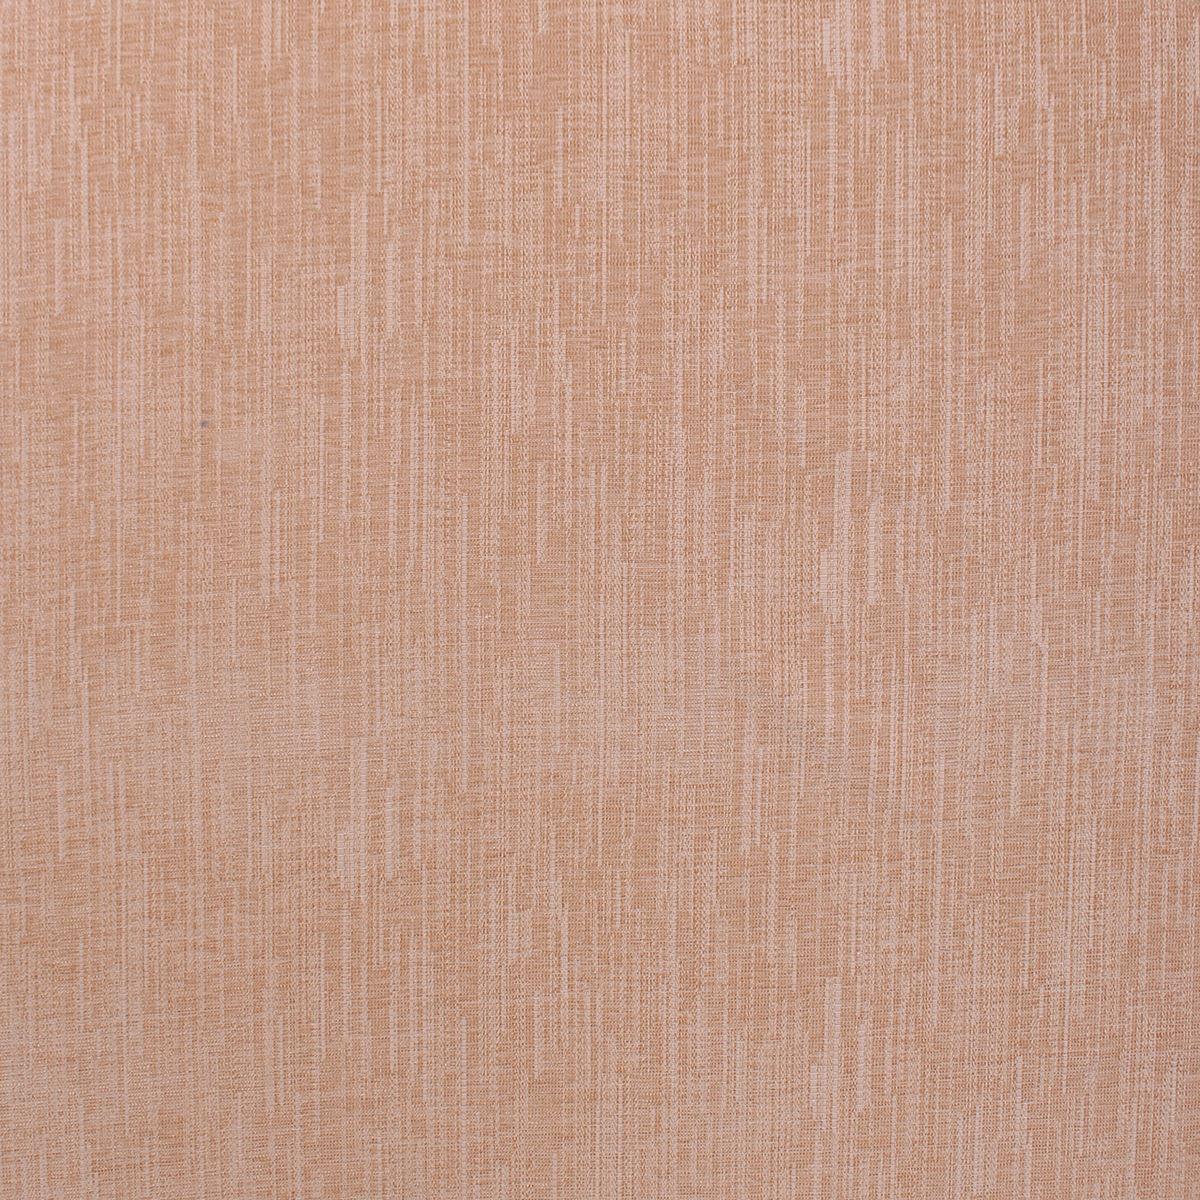 034-Chenille-034-Slubbed-Shabby-Worn-Look-Curtain-Cushion-Sofa-Upholstery-Fabric thumbnail 19